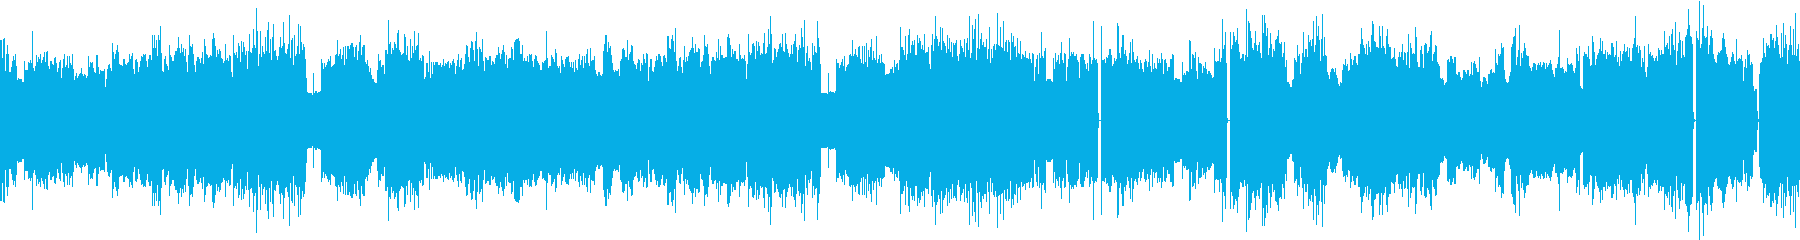 8bit風の牧歌的インストの再生済みの波形